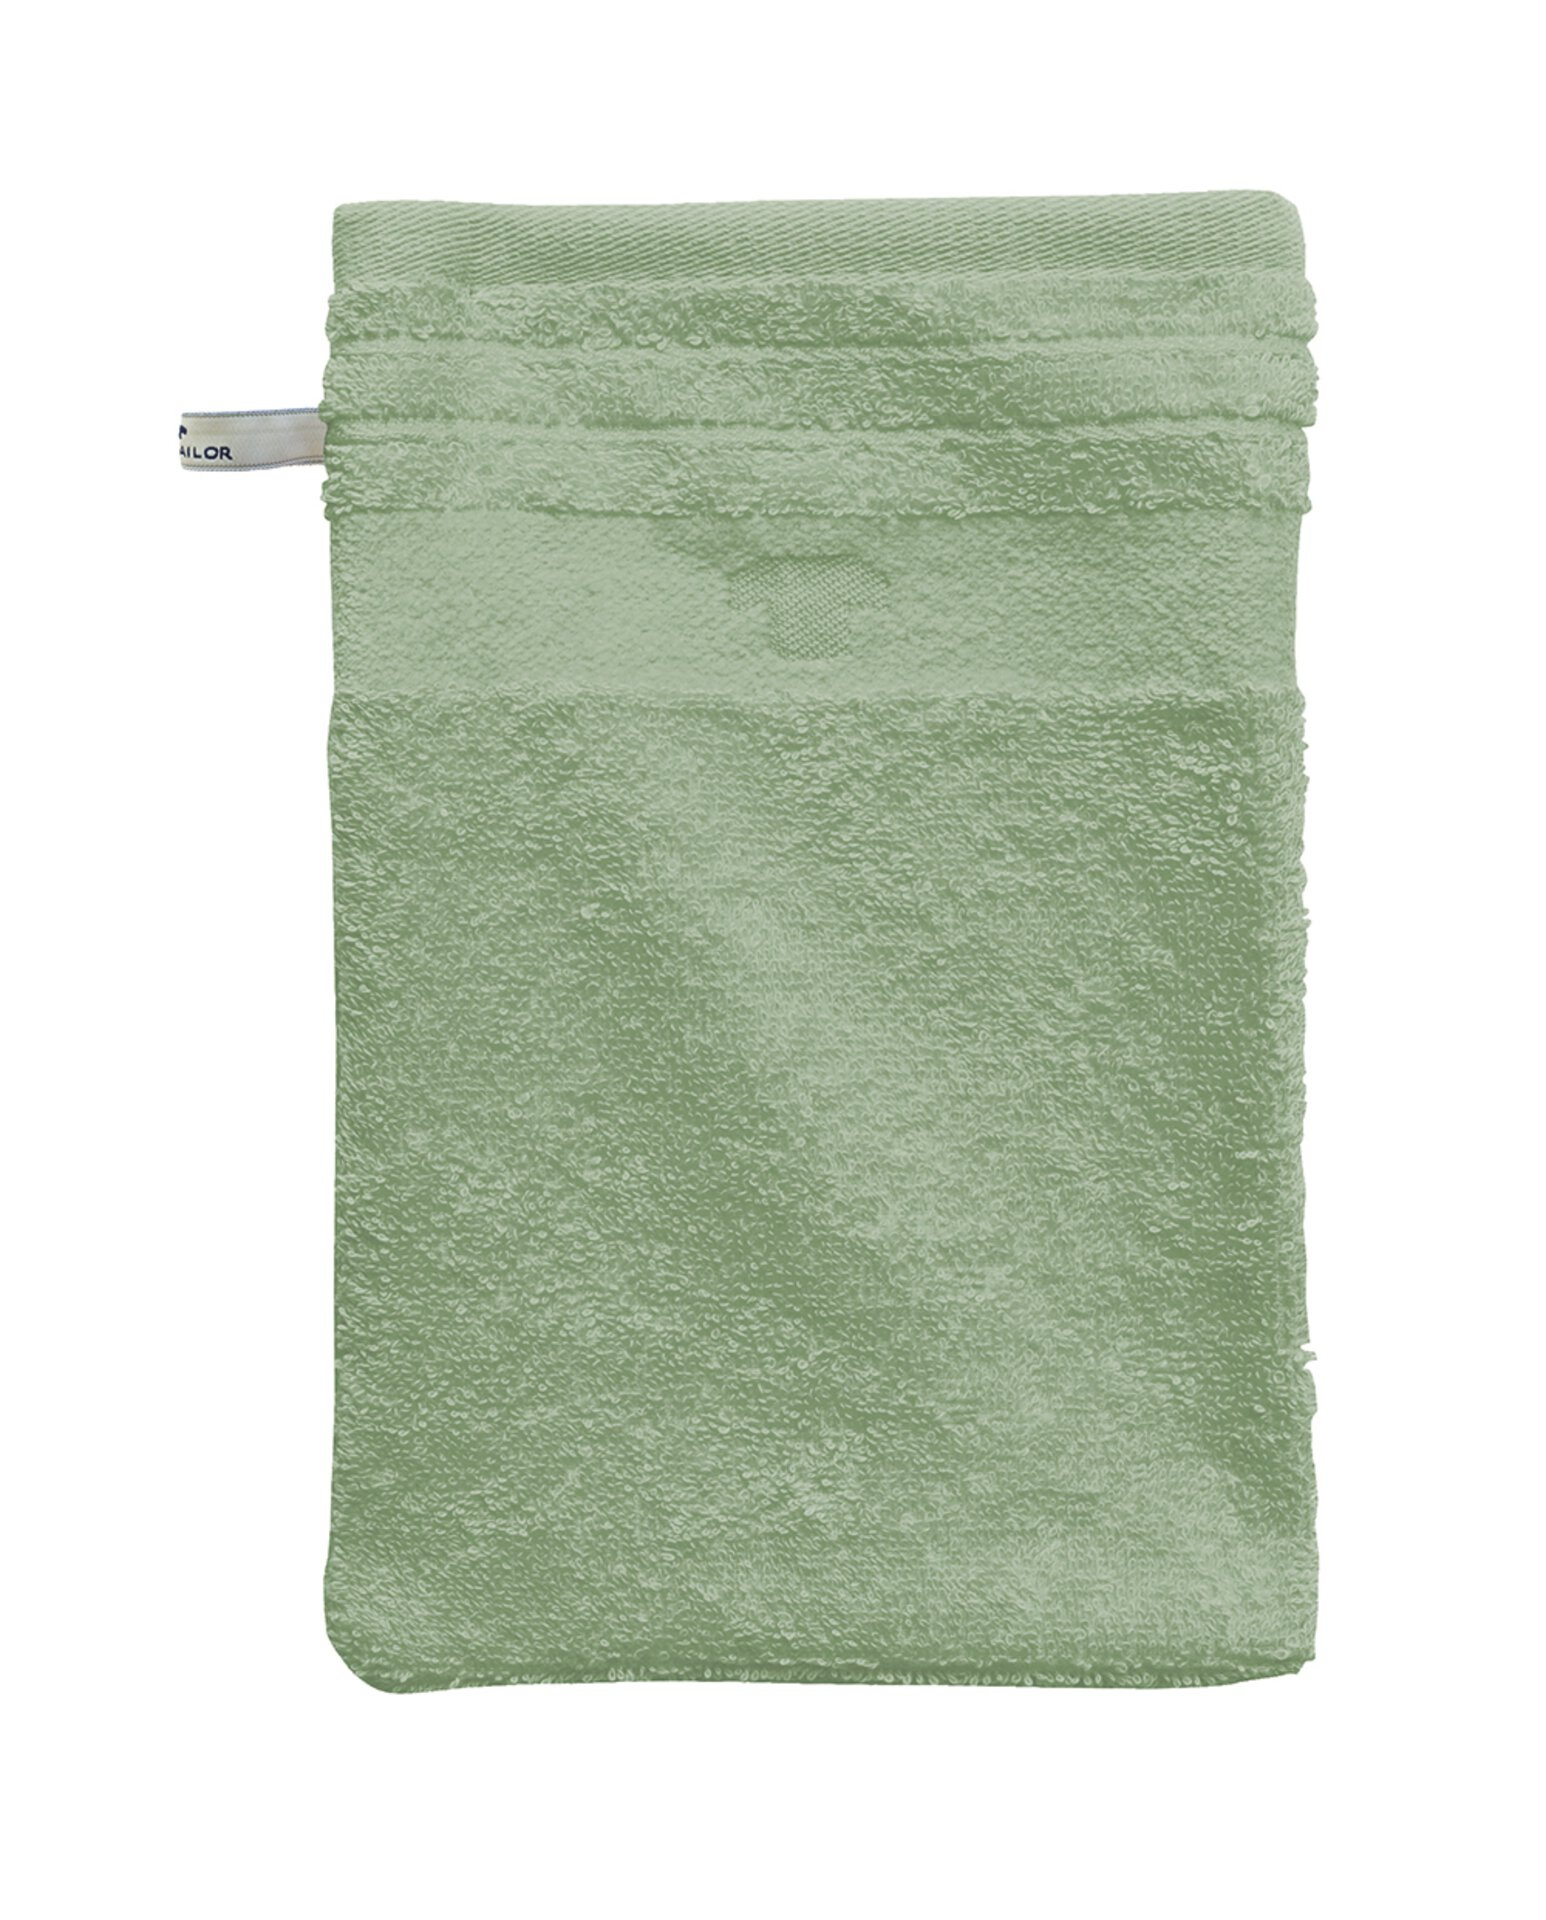 Waschhandschuh Uni Towel Tom Tailor Textil grün 16 x 22 cm